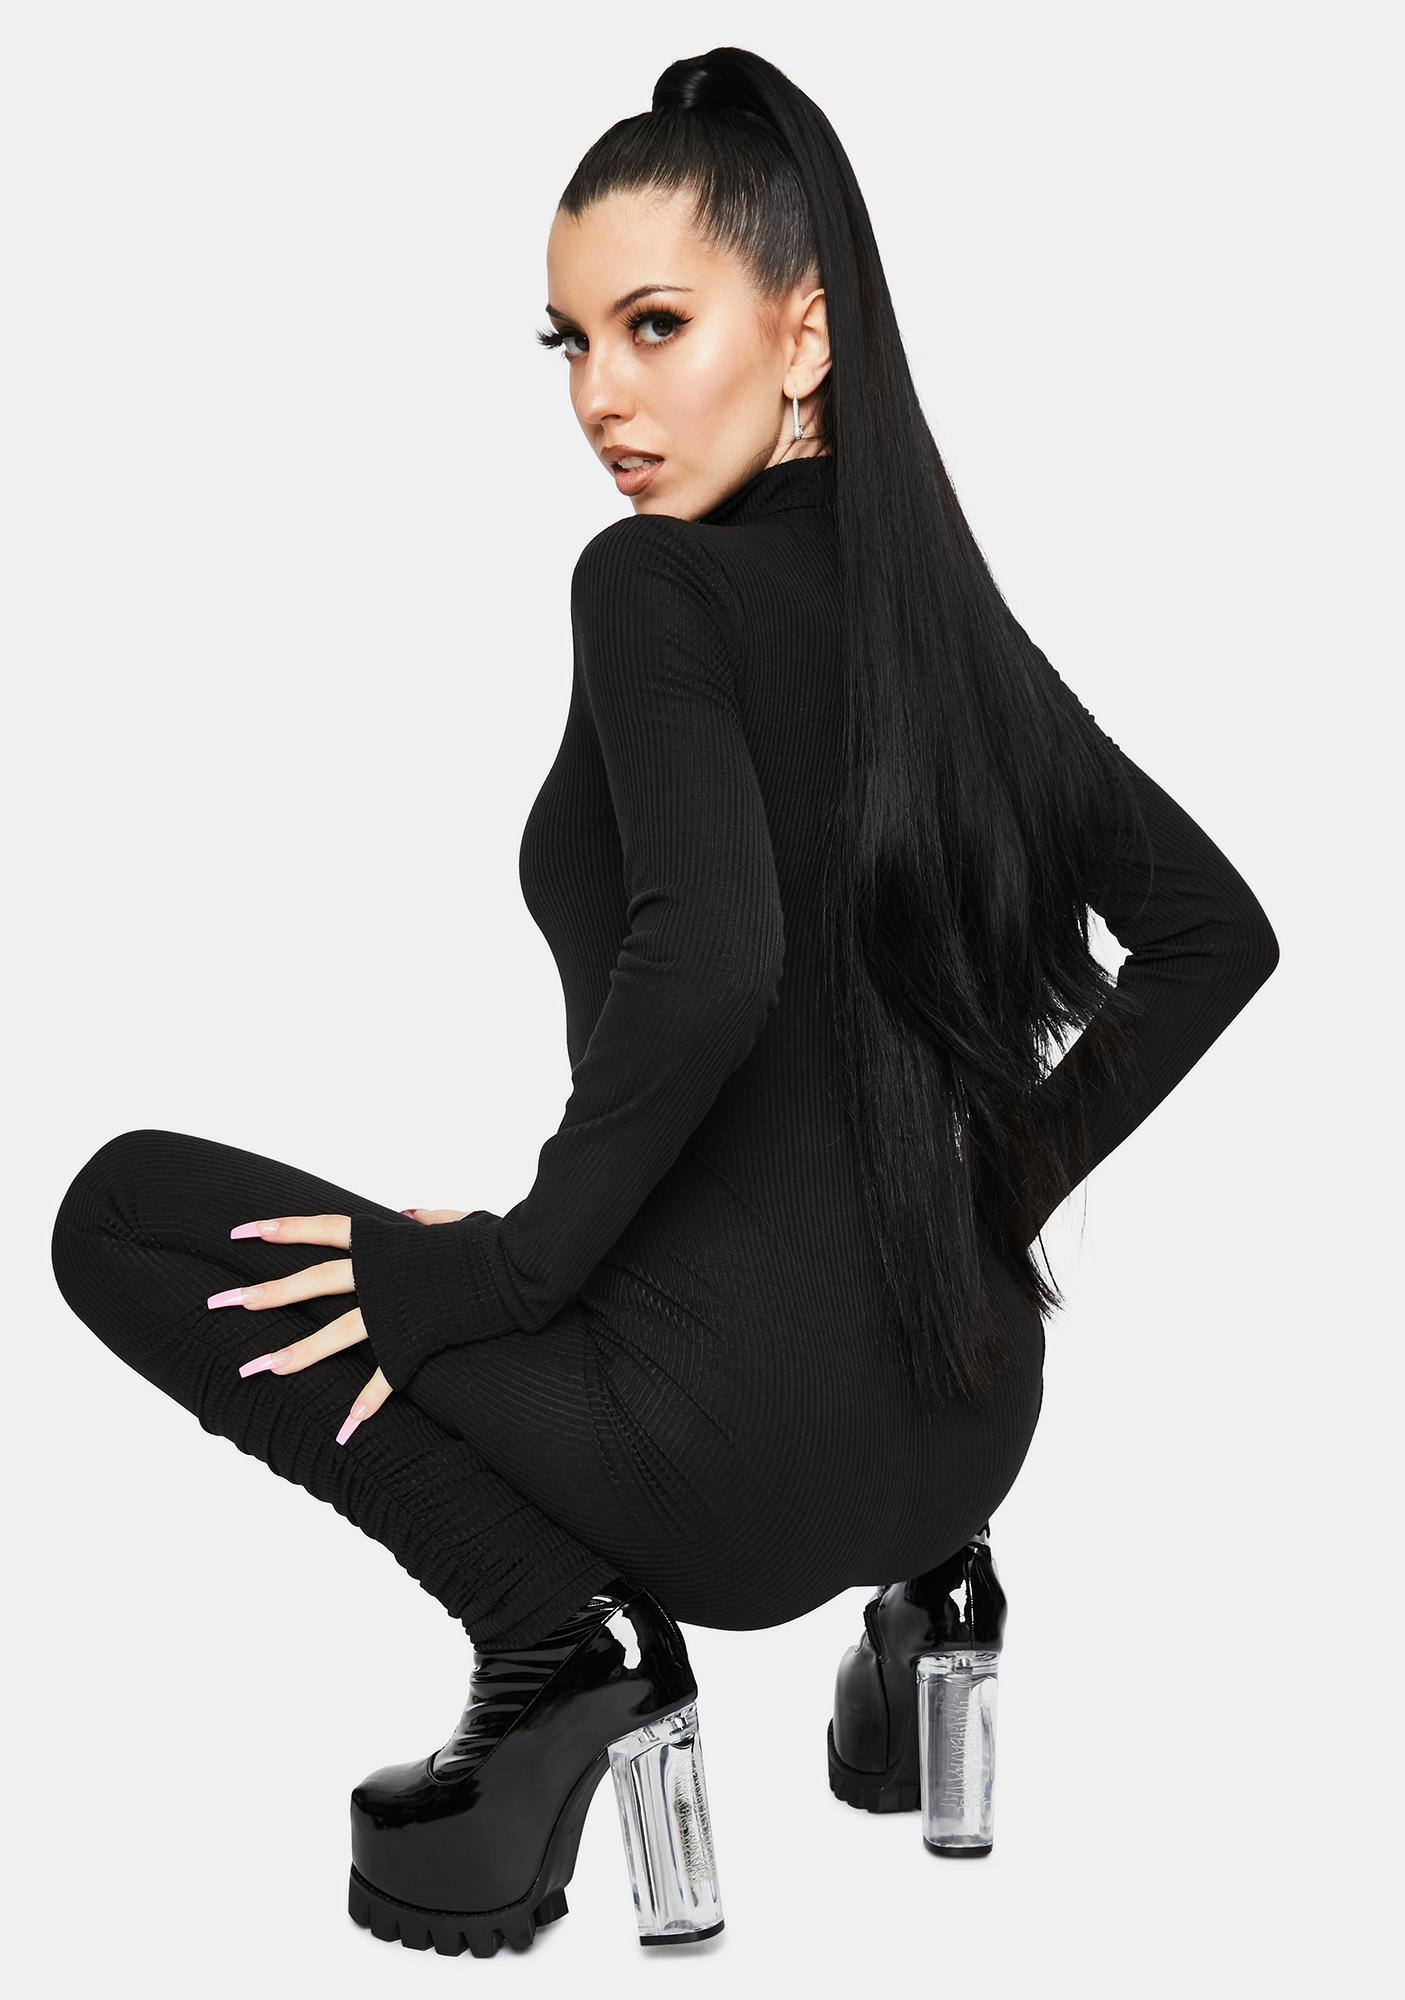 Noir Never Hold Back Zip Up Jumpsuit